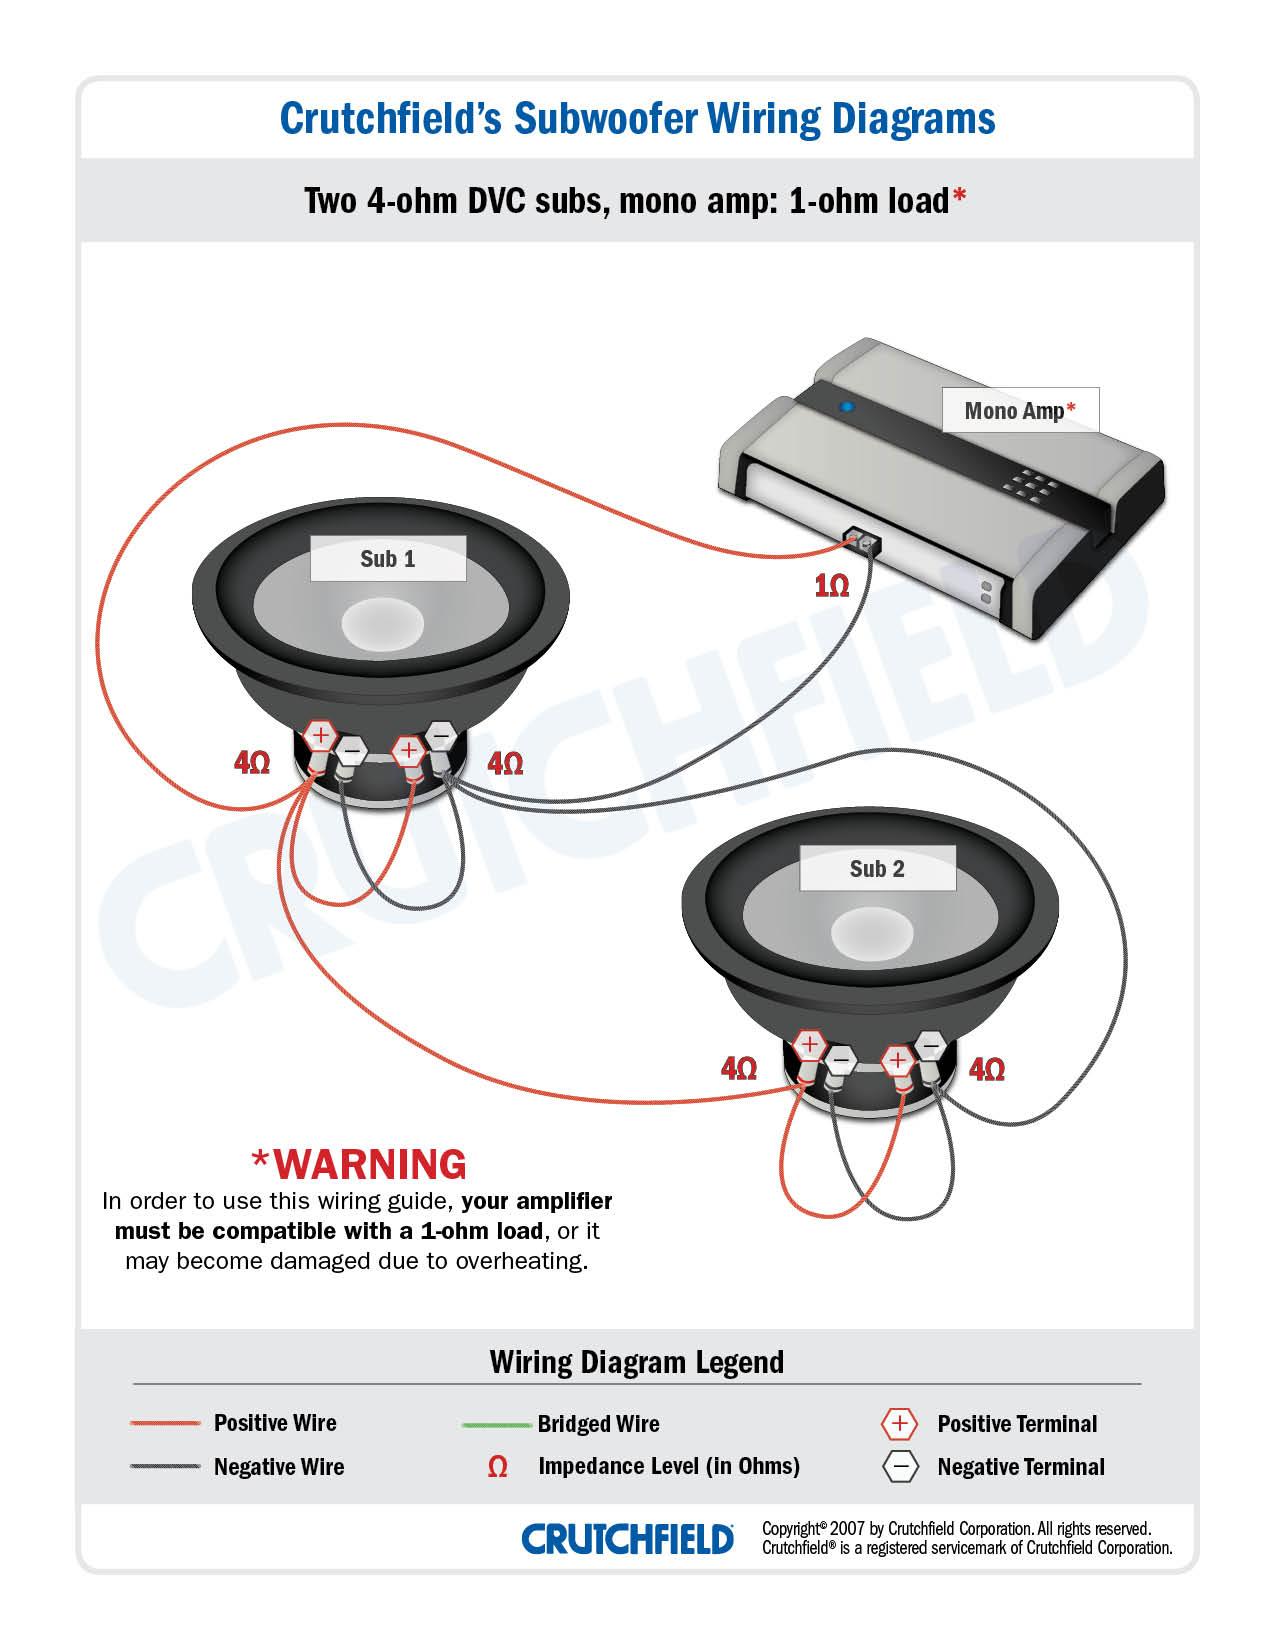 2 Ohm Dvc Subwoofer Wiring Diagram